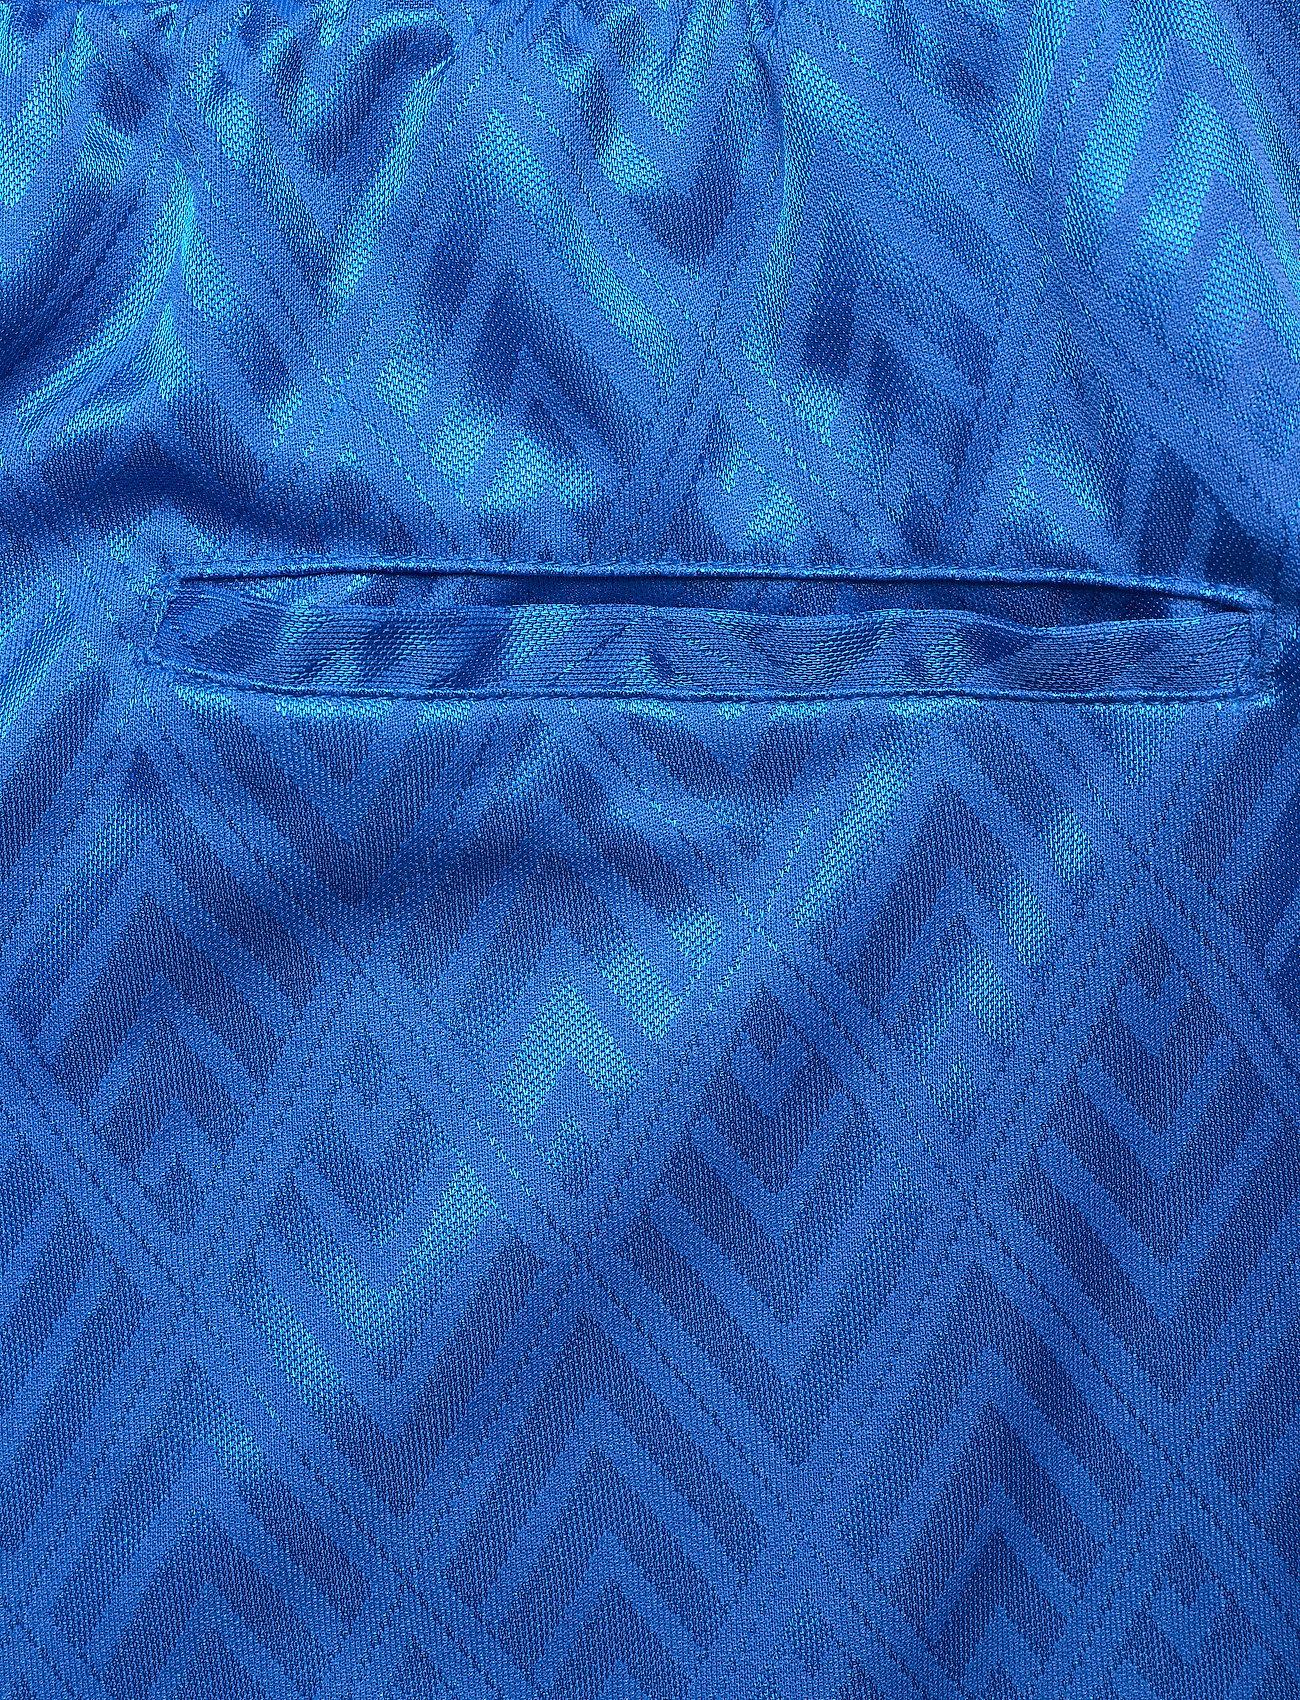 HAN Kjøbenhavn - Football Shorts - casual shorts - bright blue - 4